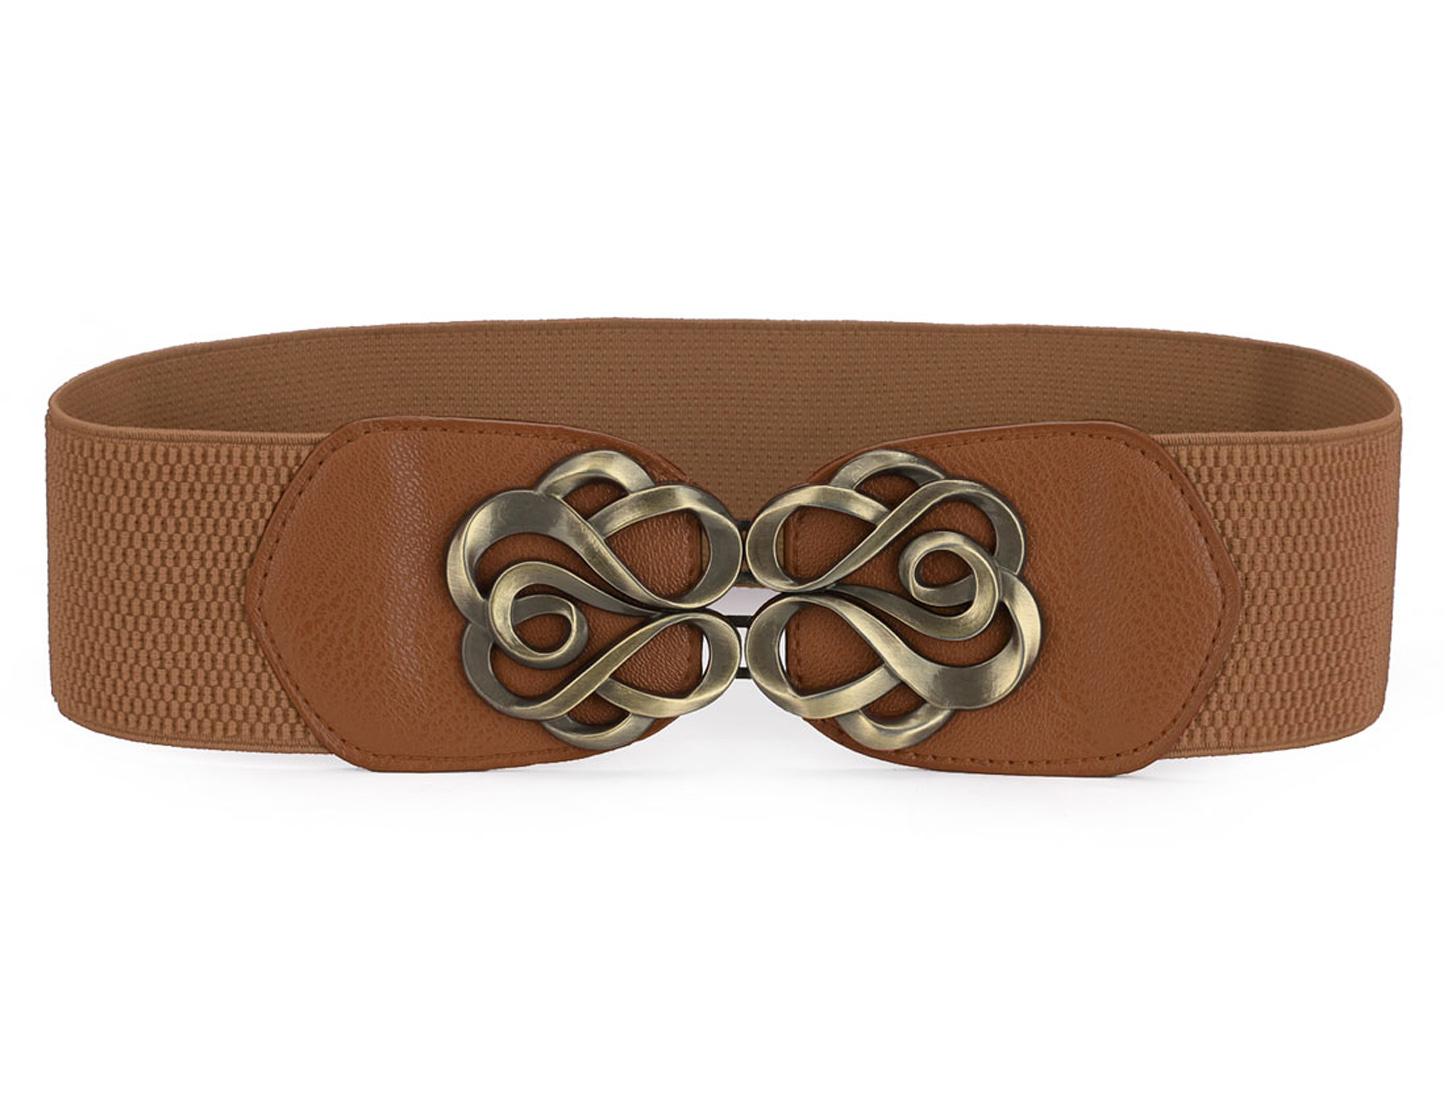 Lady Bronze Tone Flower Interlock Buckle Style Textured Elastic Cinch Belt Brown